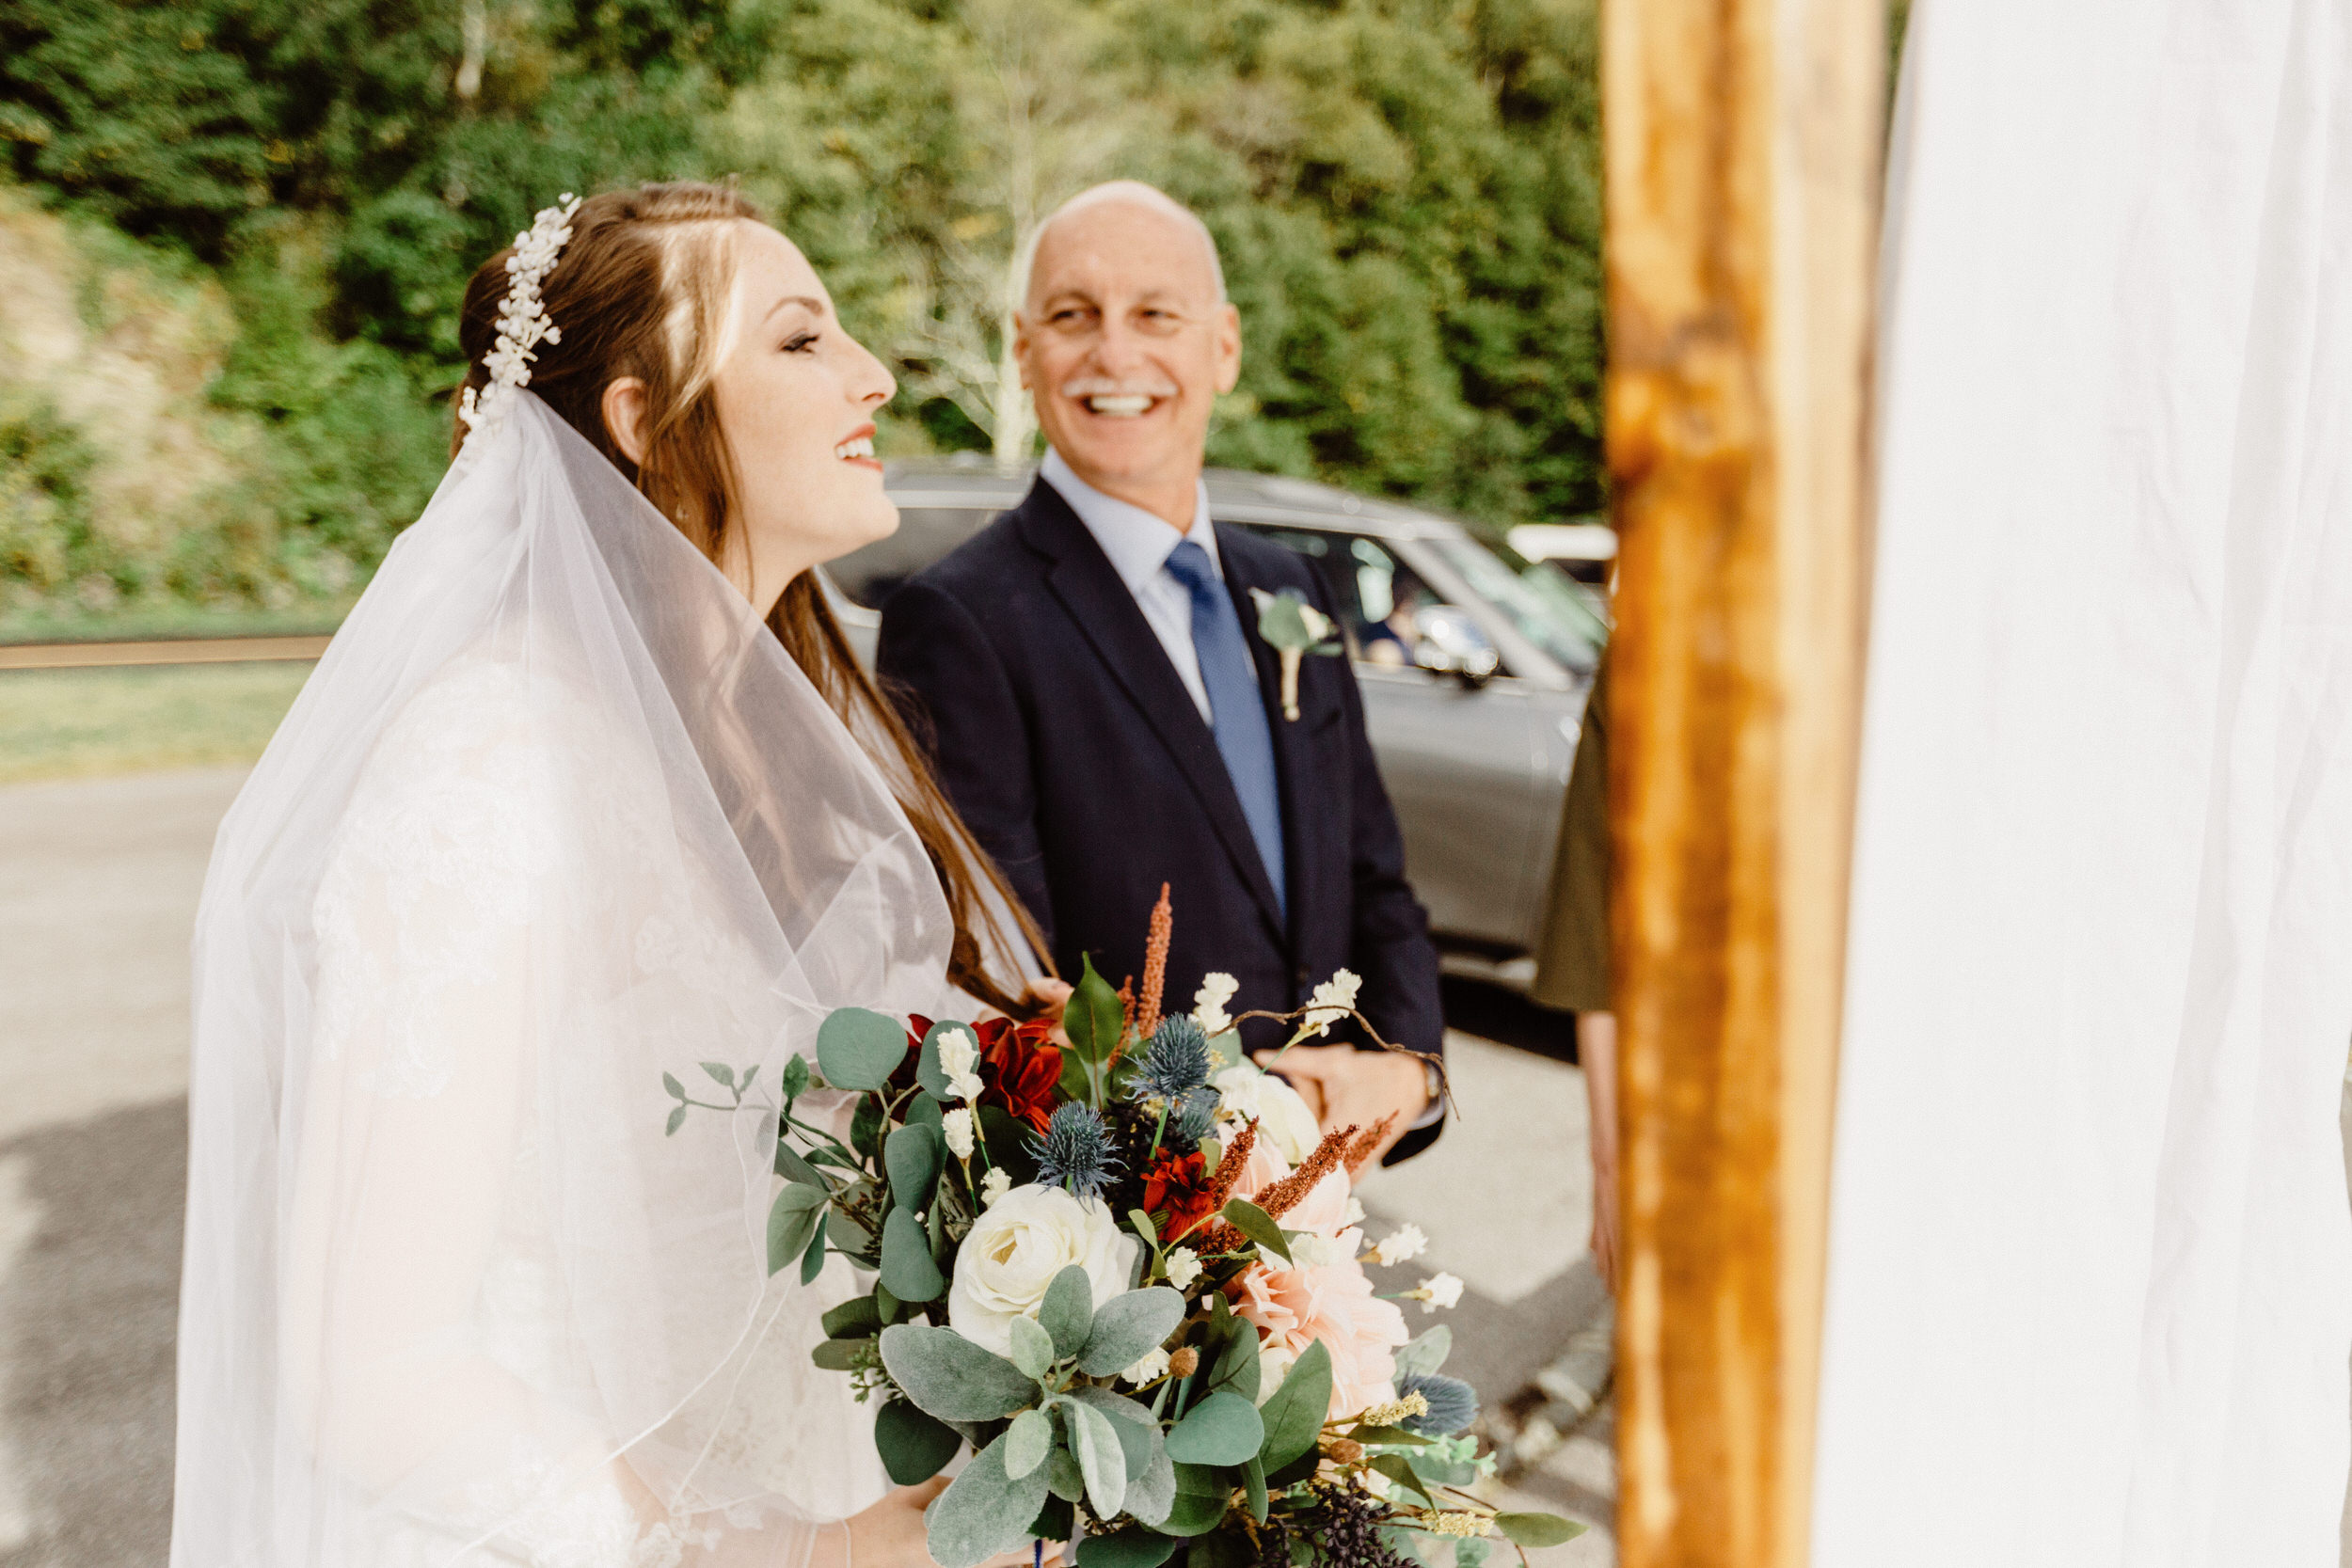 3. Elopement Ceremony- Cole + Rachel's Great Smoky Mountain National Park Elopement-37.jpg